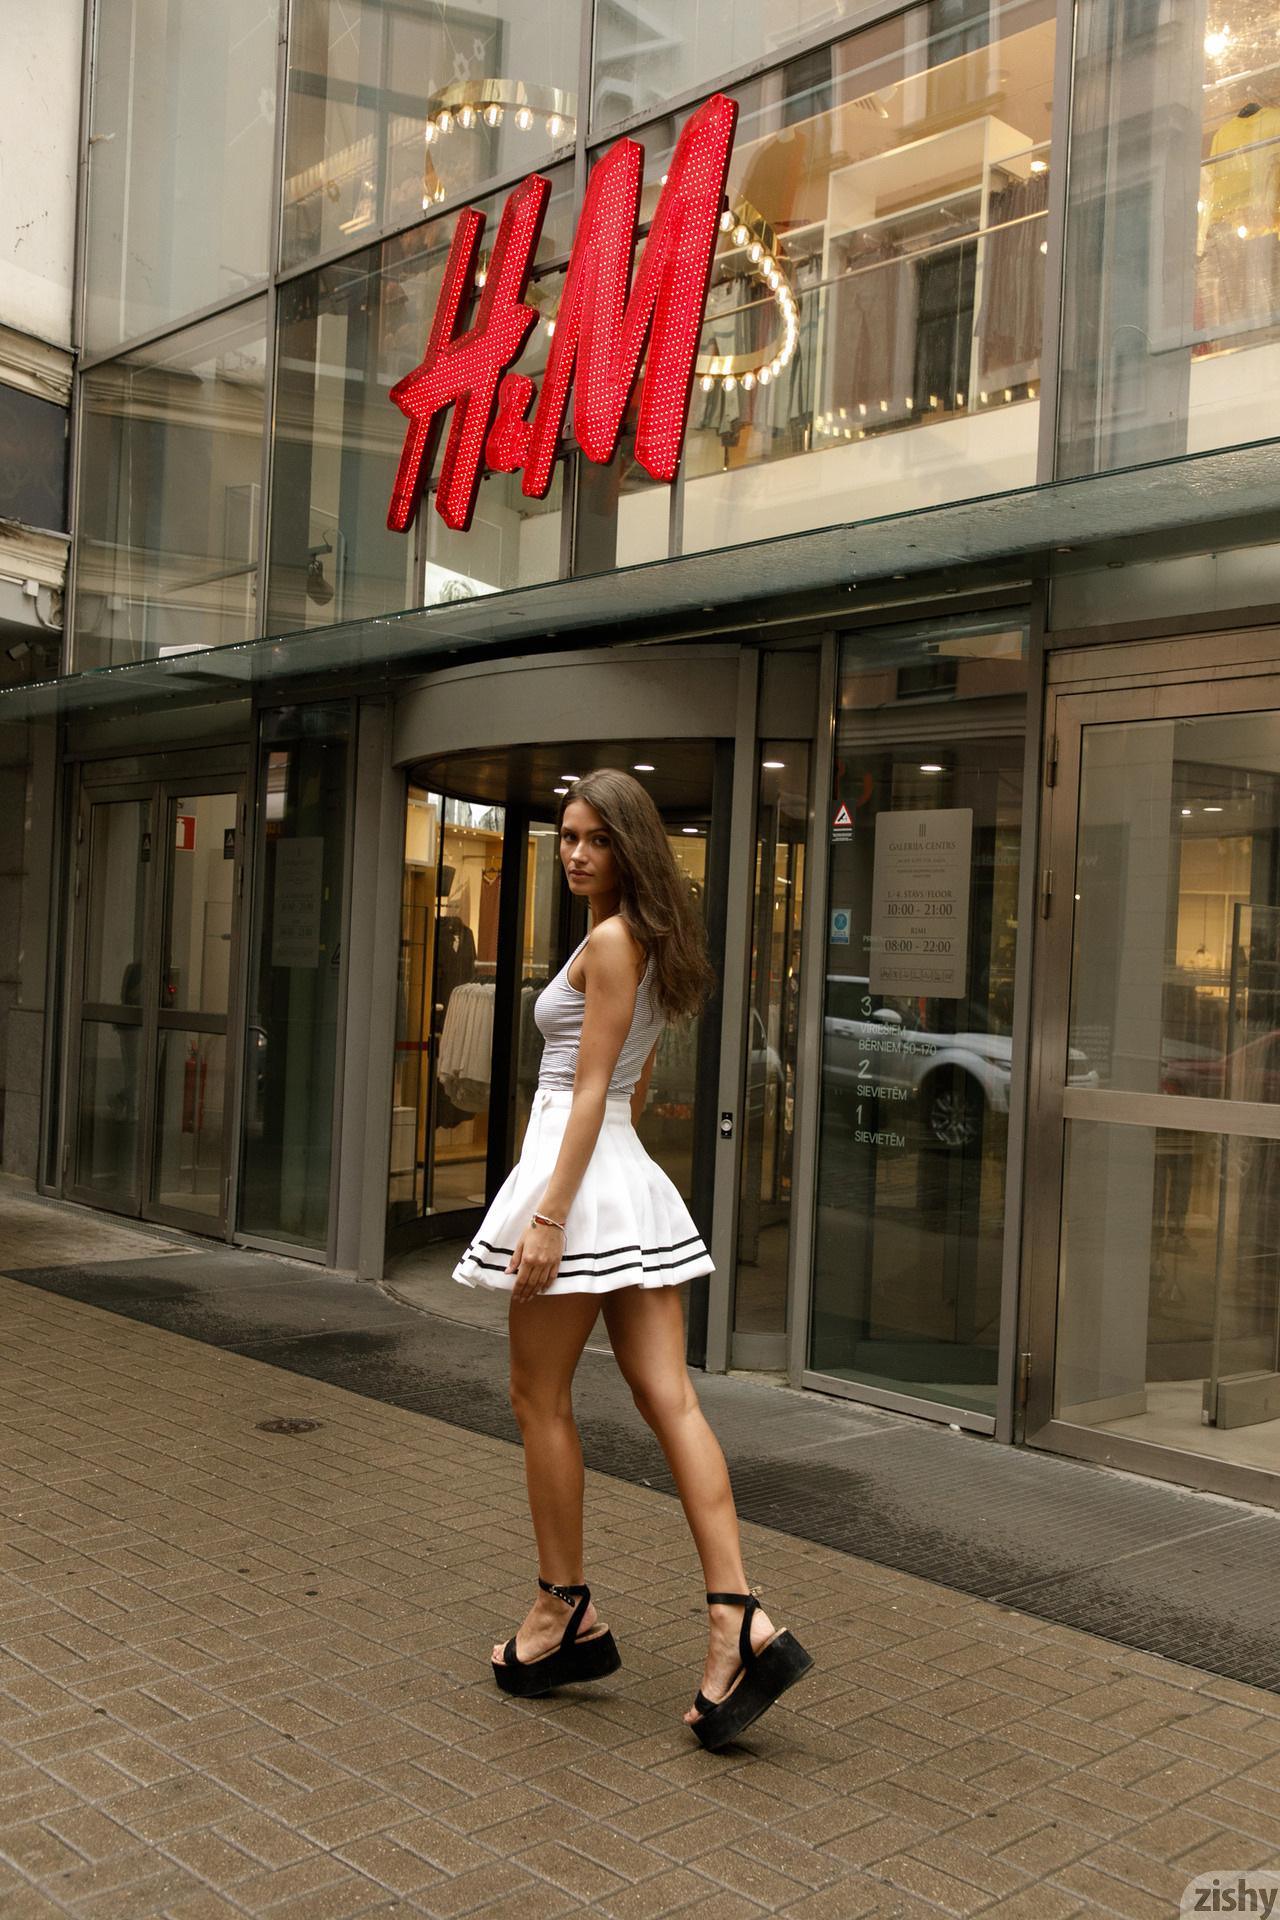 Shyla Volbeck Shopping With The Devil Zishy (4)